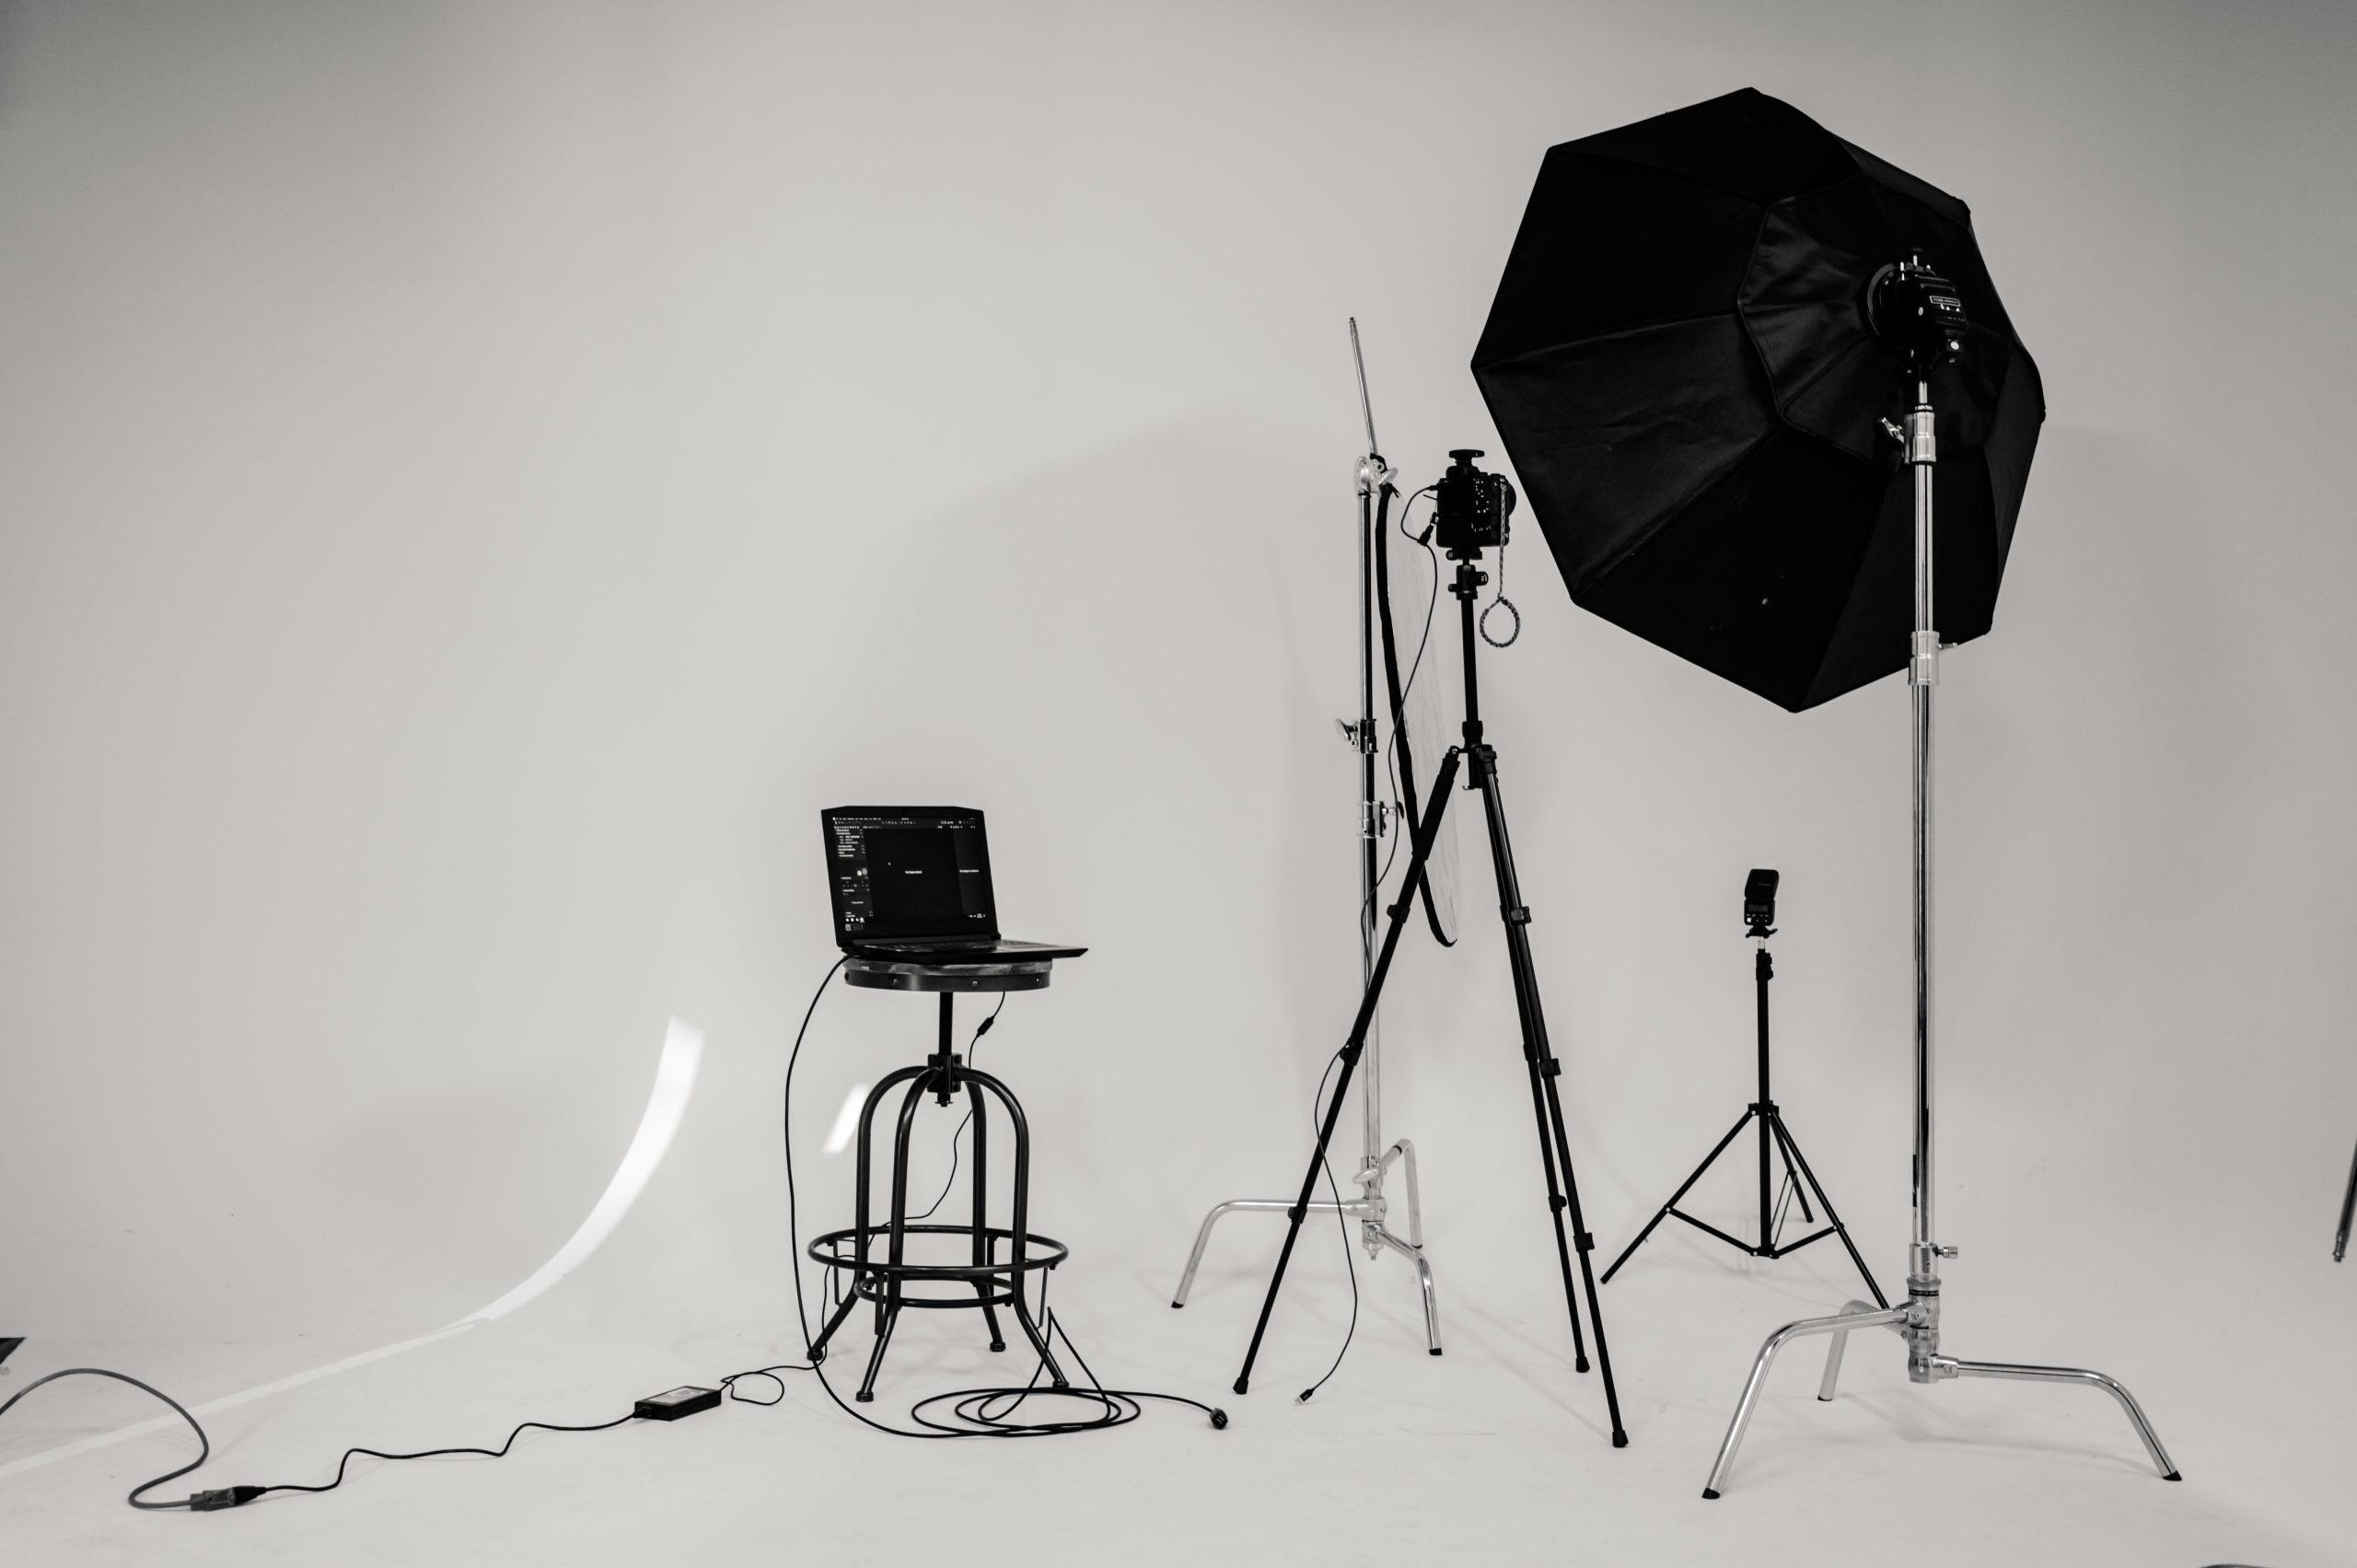 Digital Photography Studio Equipment